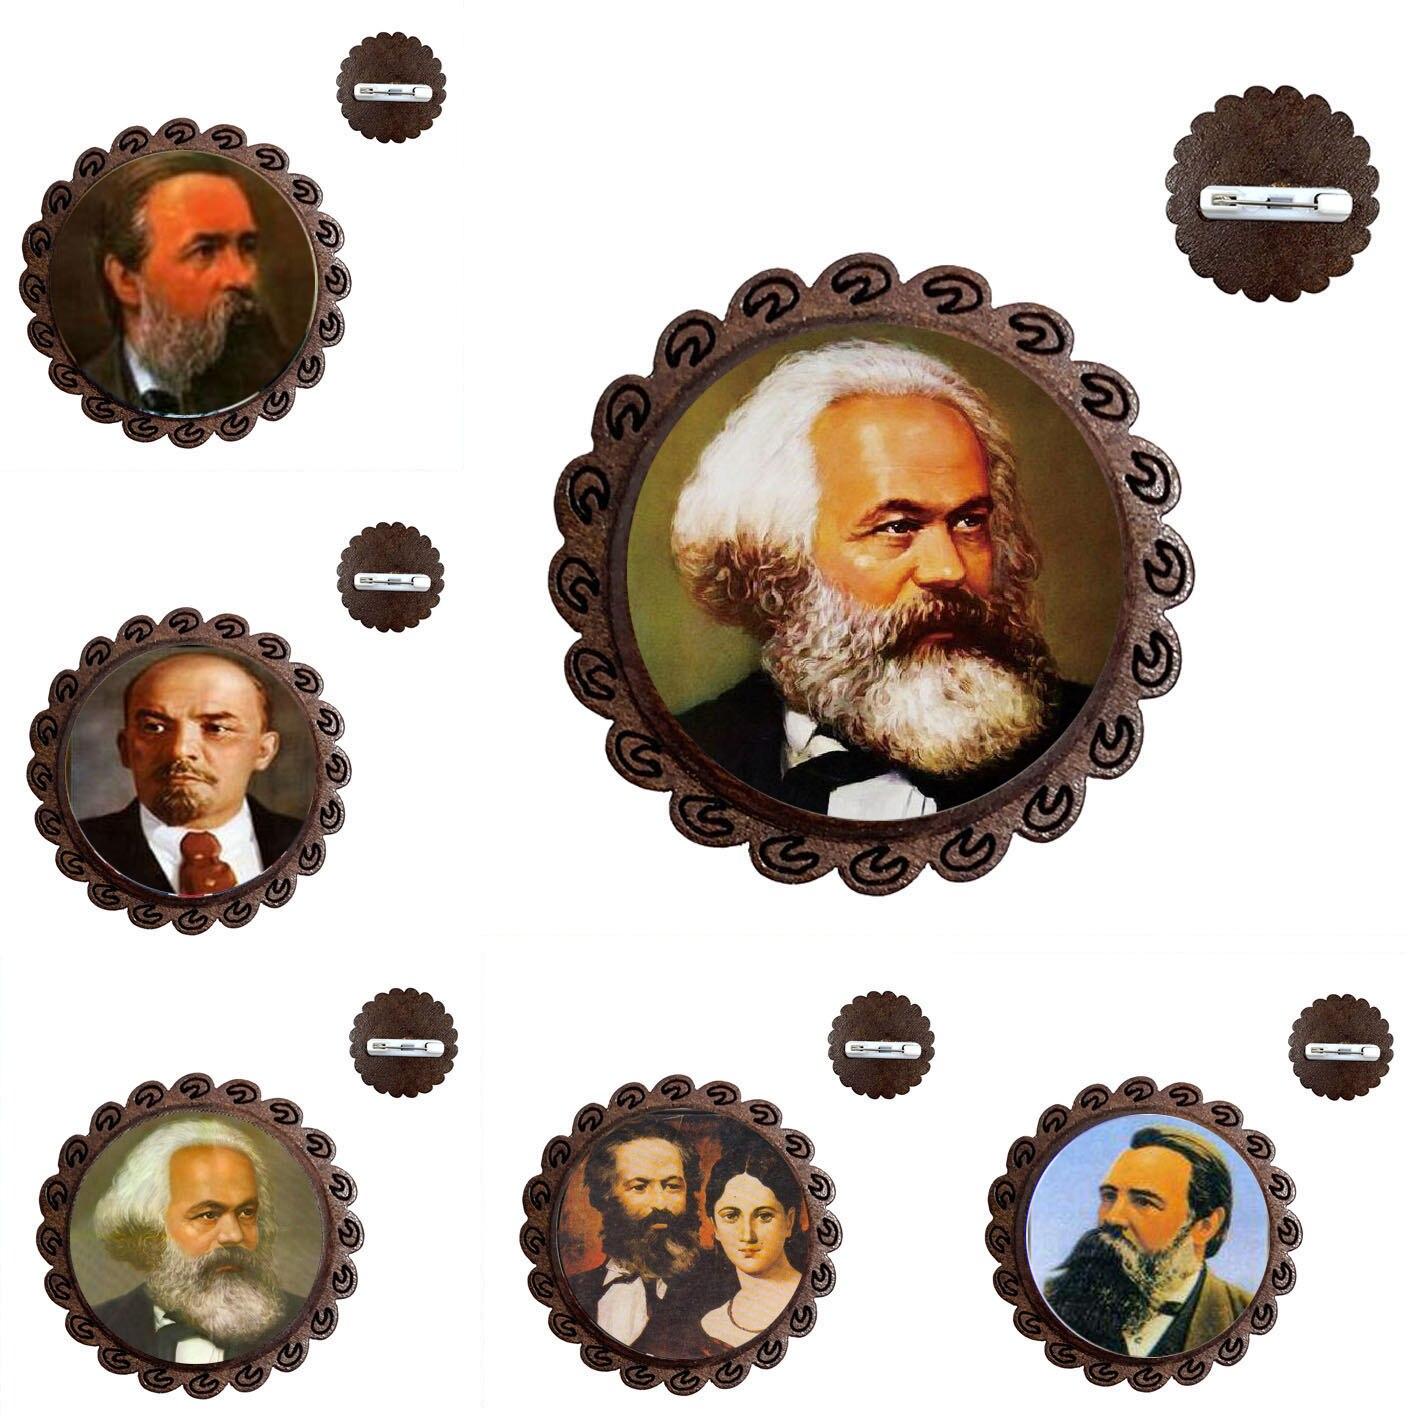 Broche marxista-leninista Mao Zedong pensador cristal de 20mm Gema del Time producción...